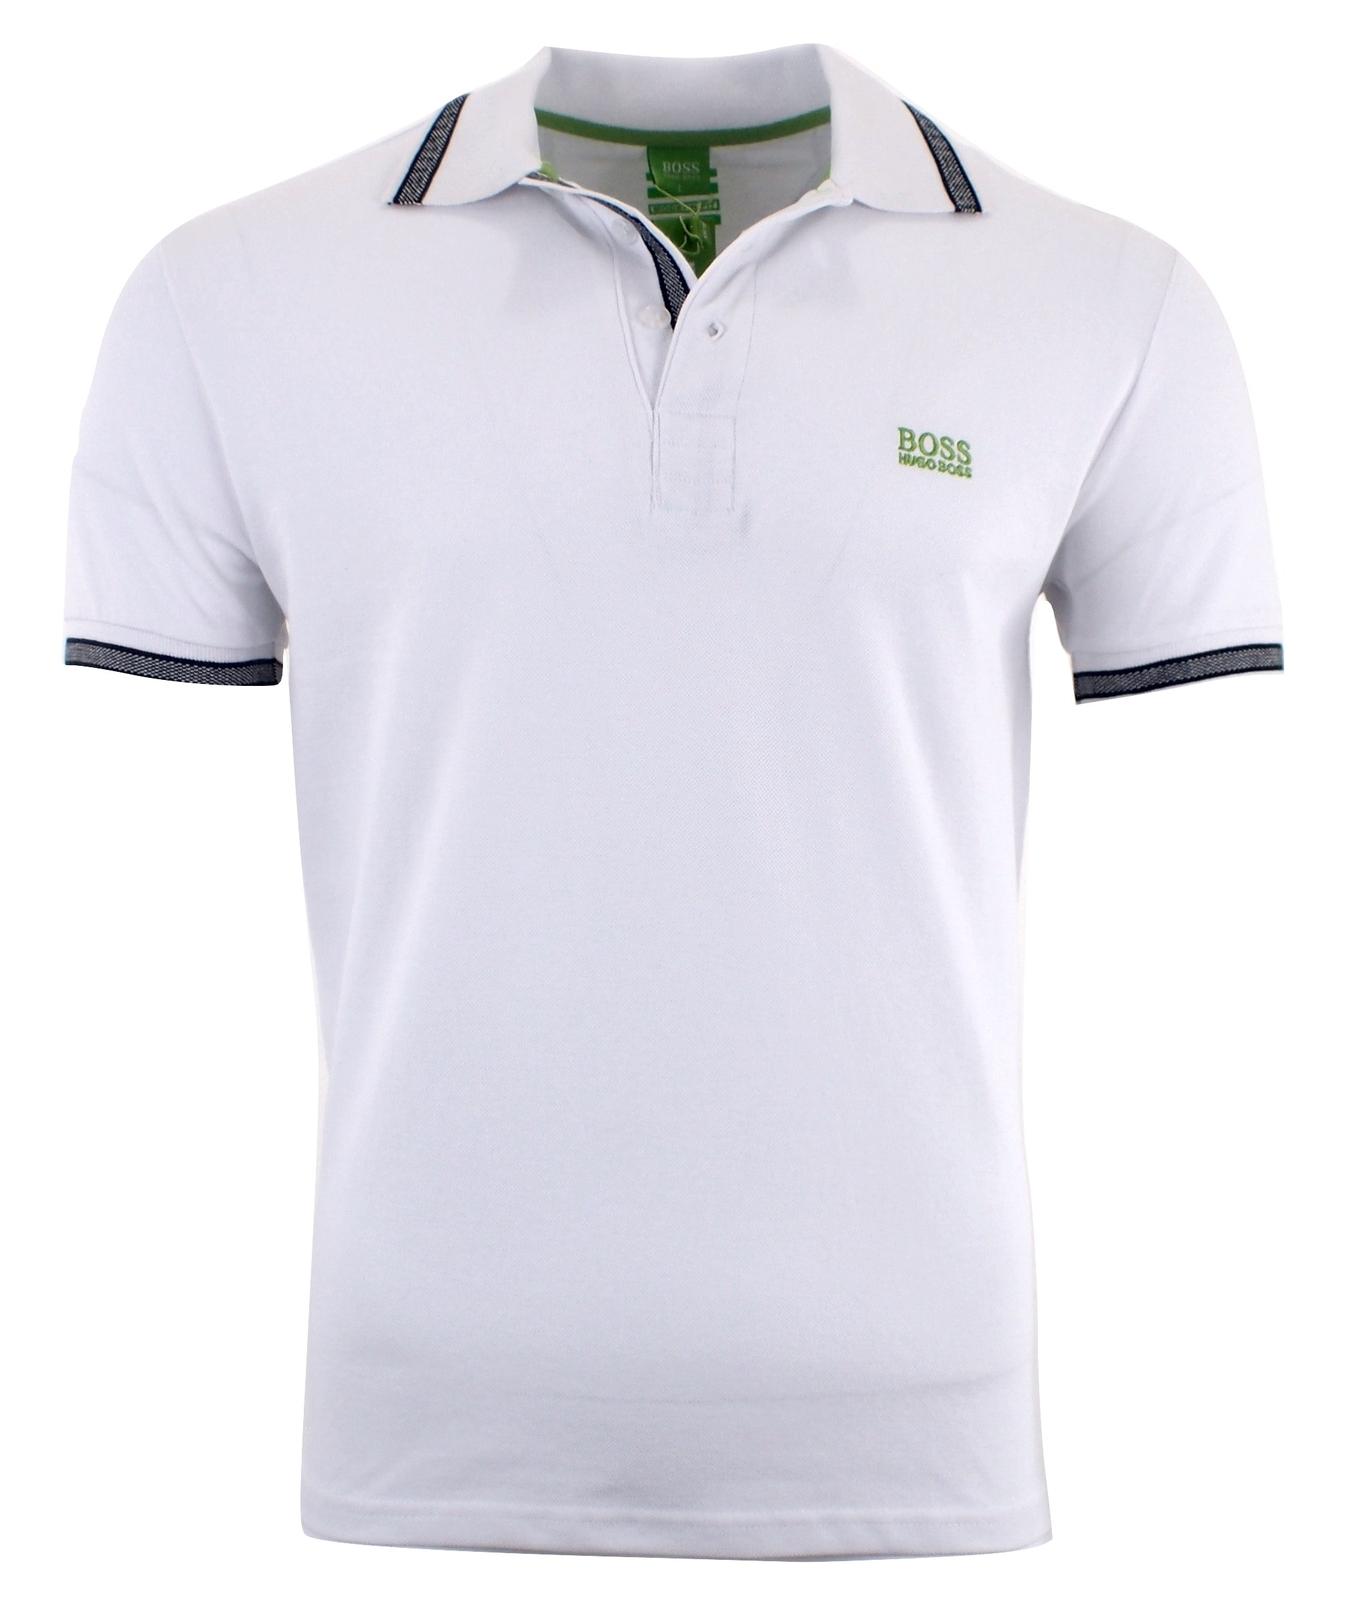 Hugo Boss Men's Short Sleeve Modern Fit 100% Cotton Polo Shirt WHITE S M L XL XX for sale  USA